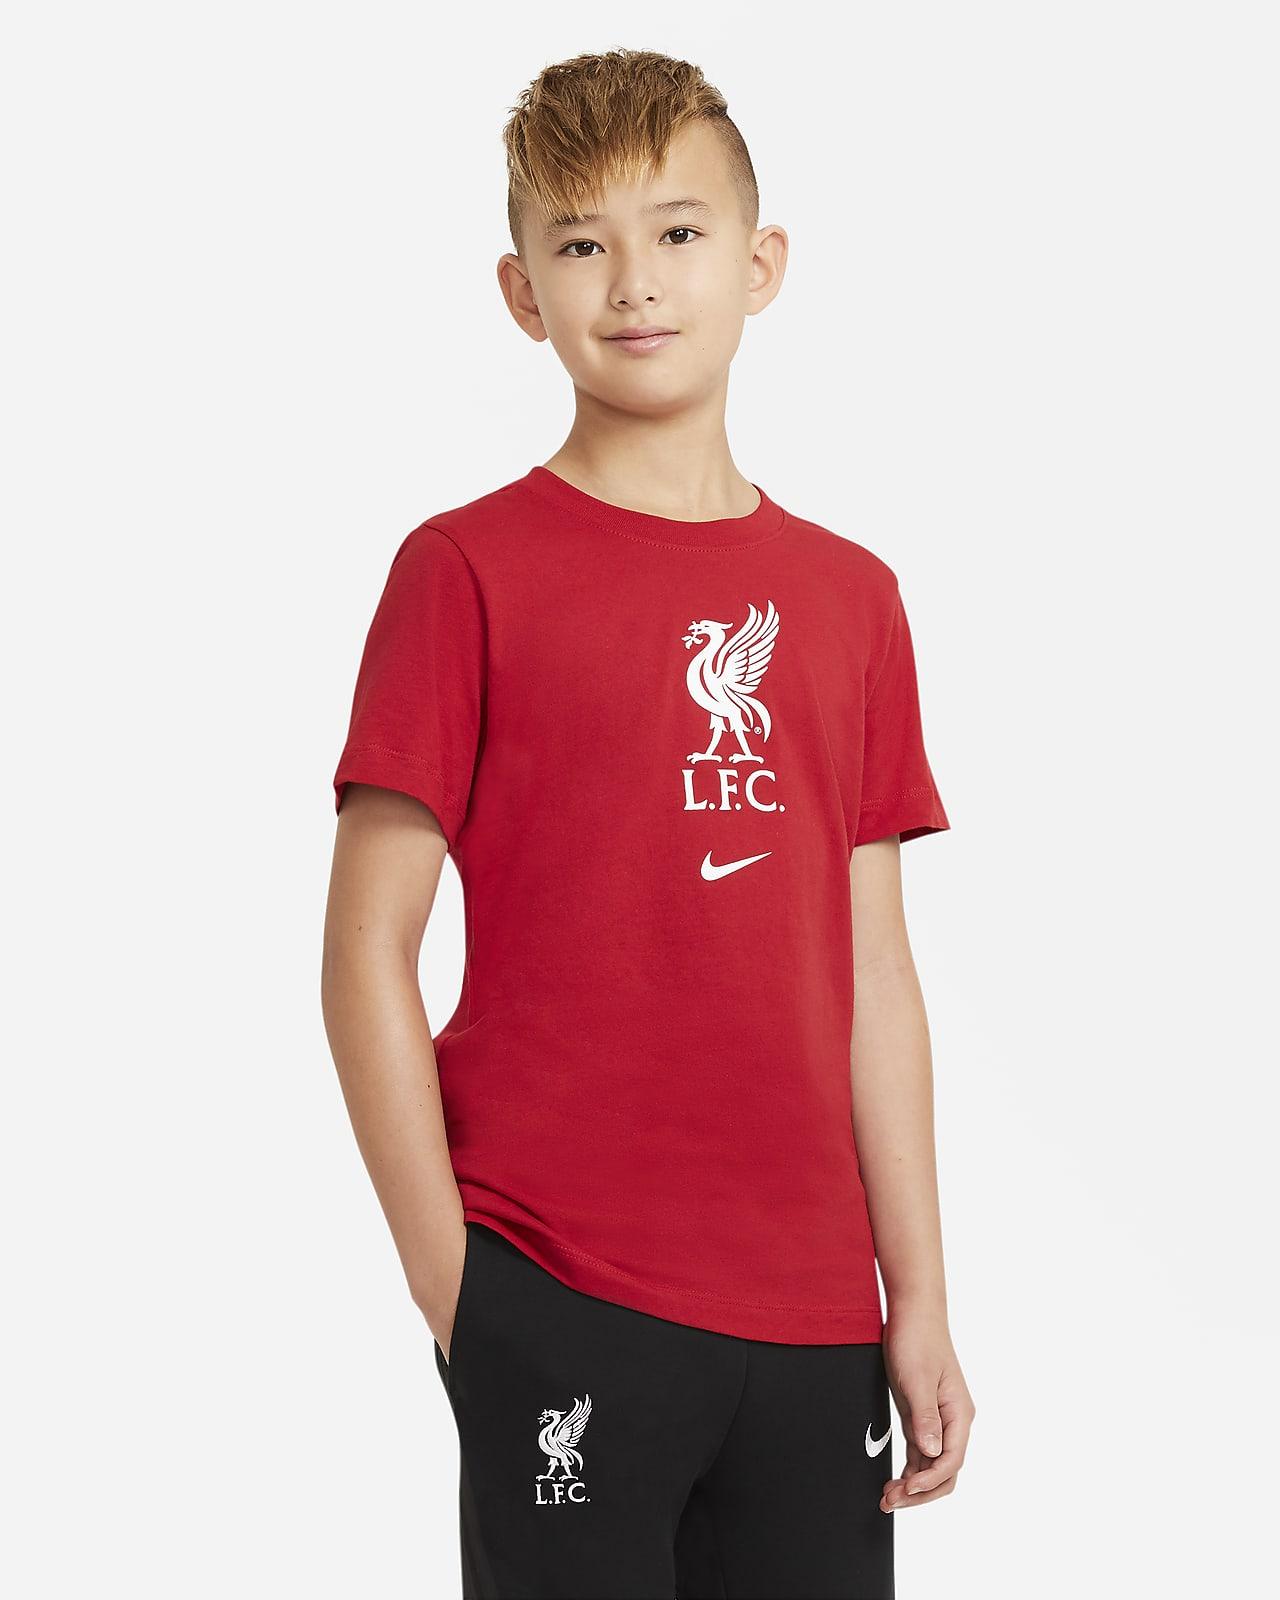 Liverpool FC Genç Çocuk Futbol Tişörtü